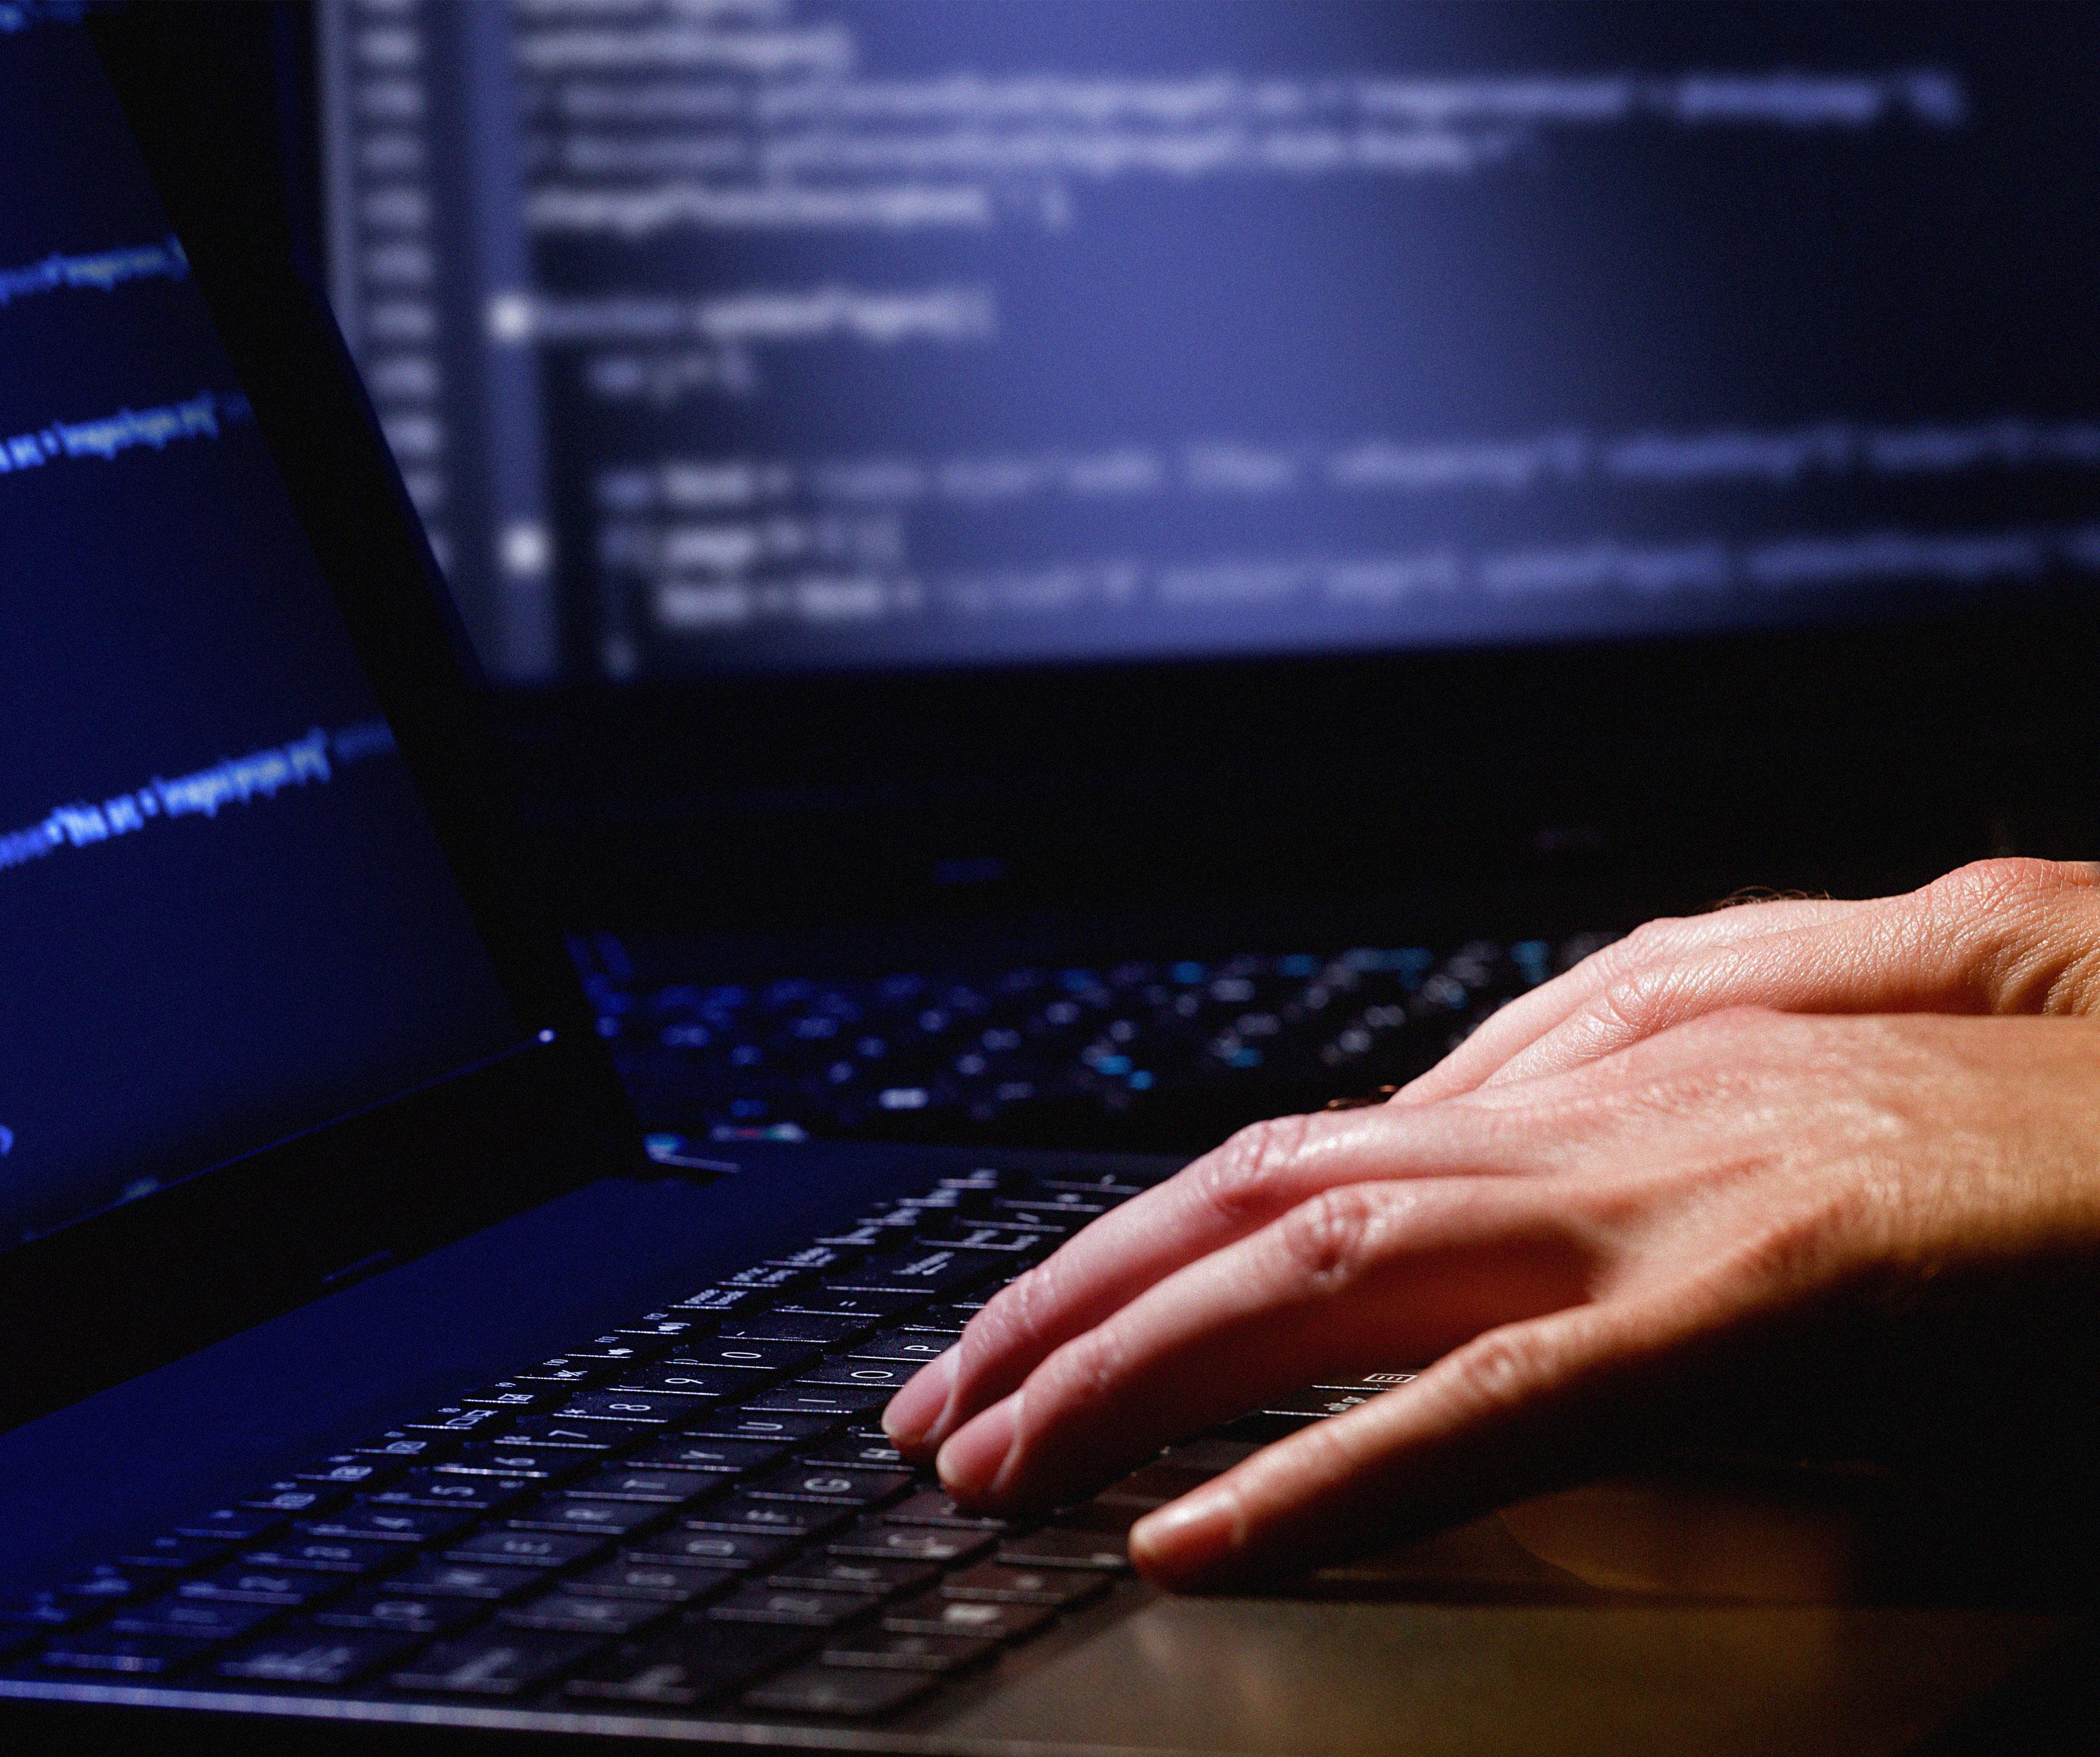 VPN 新手入門 (上篇):如何安全上網並確保自己的隱私?